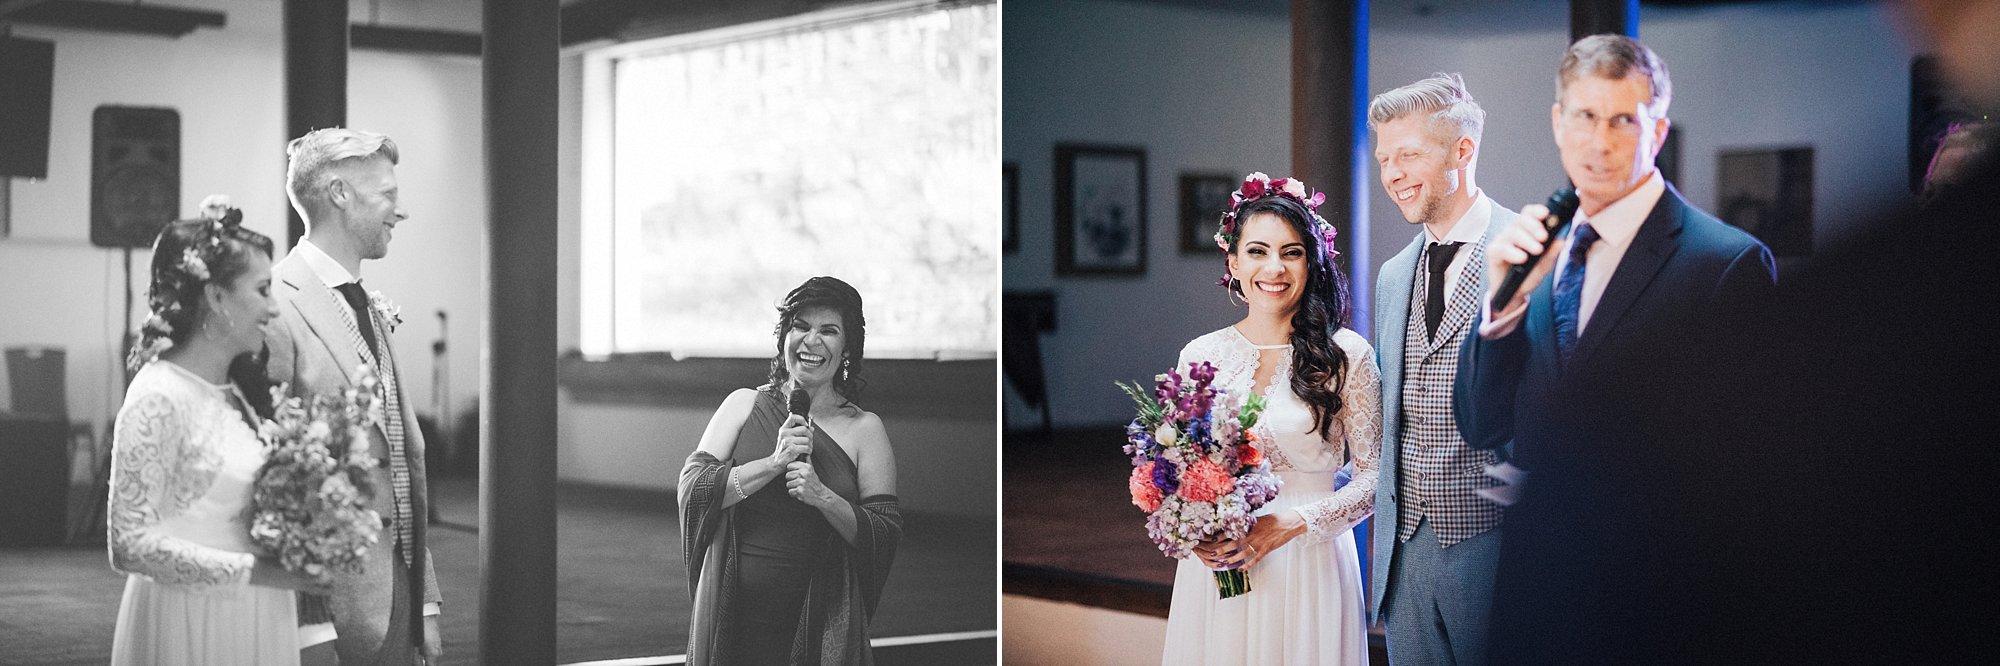 alex-yazmin-wedding-photographer-antigua-guatemala-108